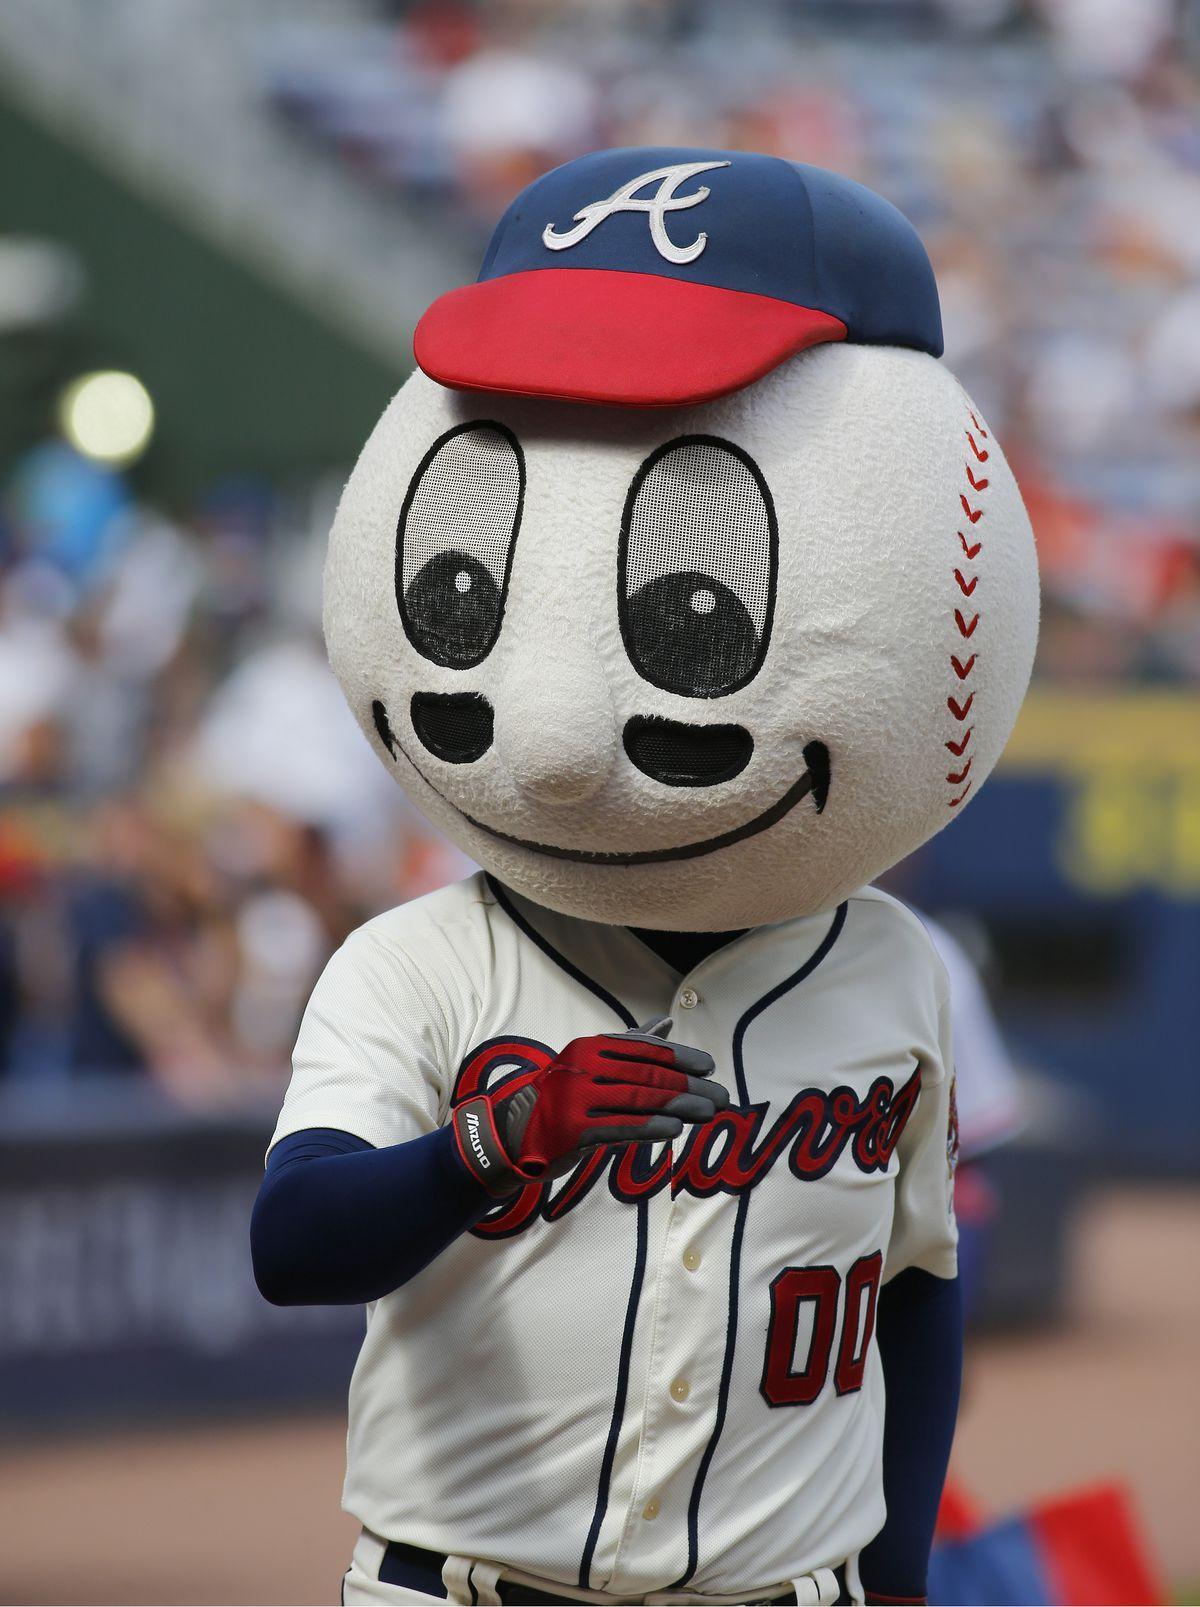 MLB: OCT 02 Tigers at Braves